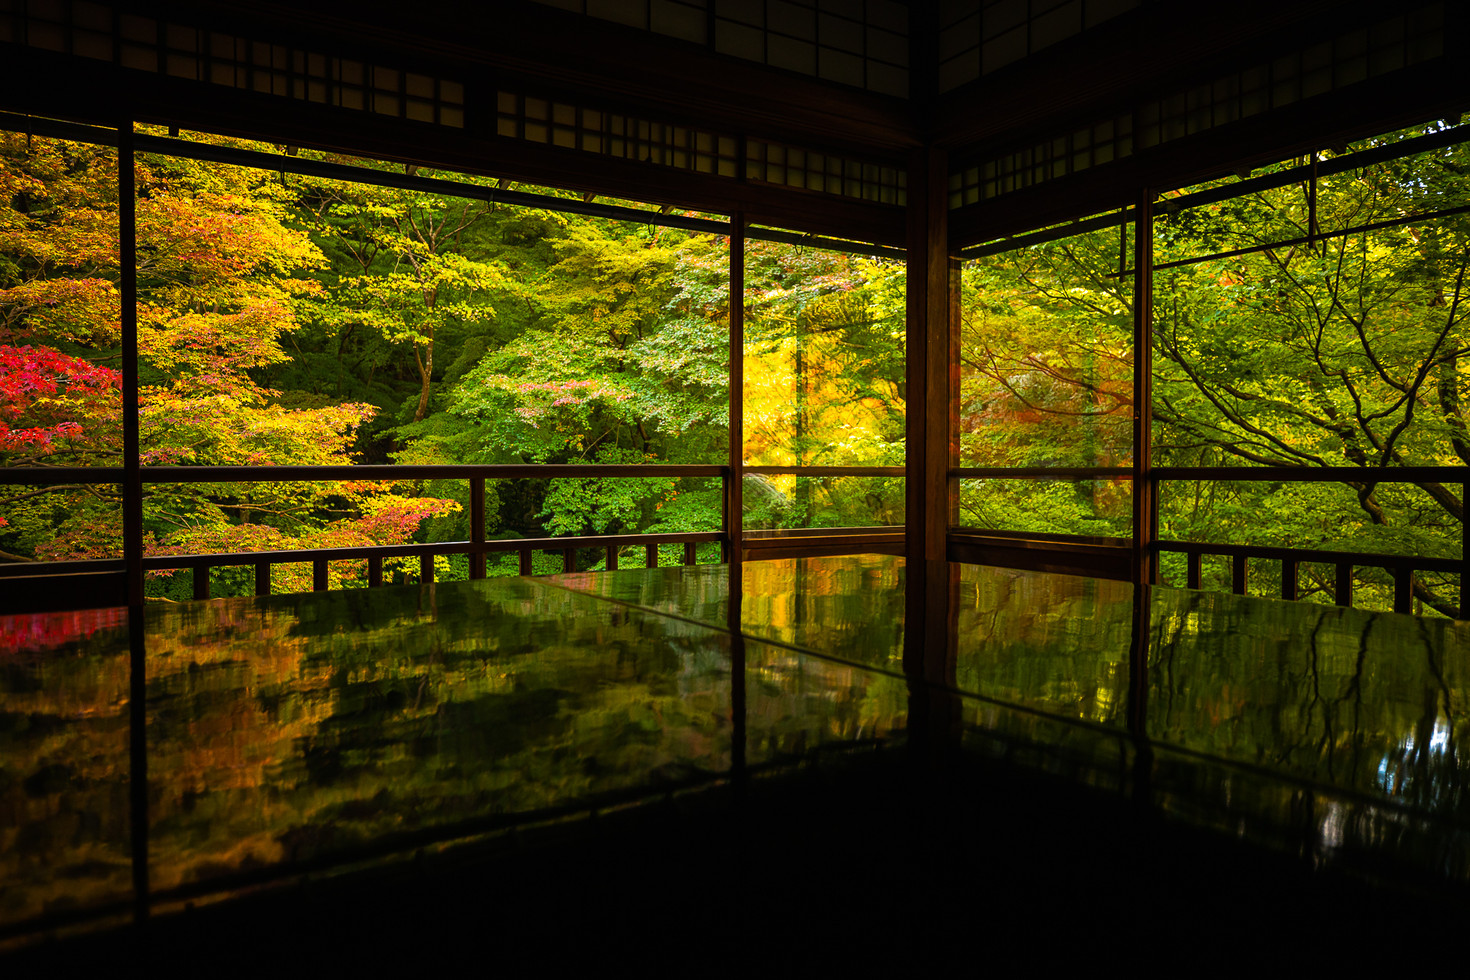 TKPA-Kyoto201911-0064-HDWH.jpg